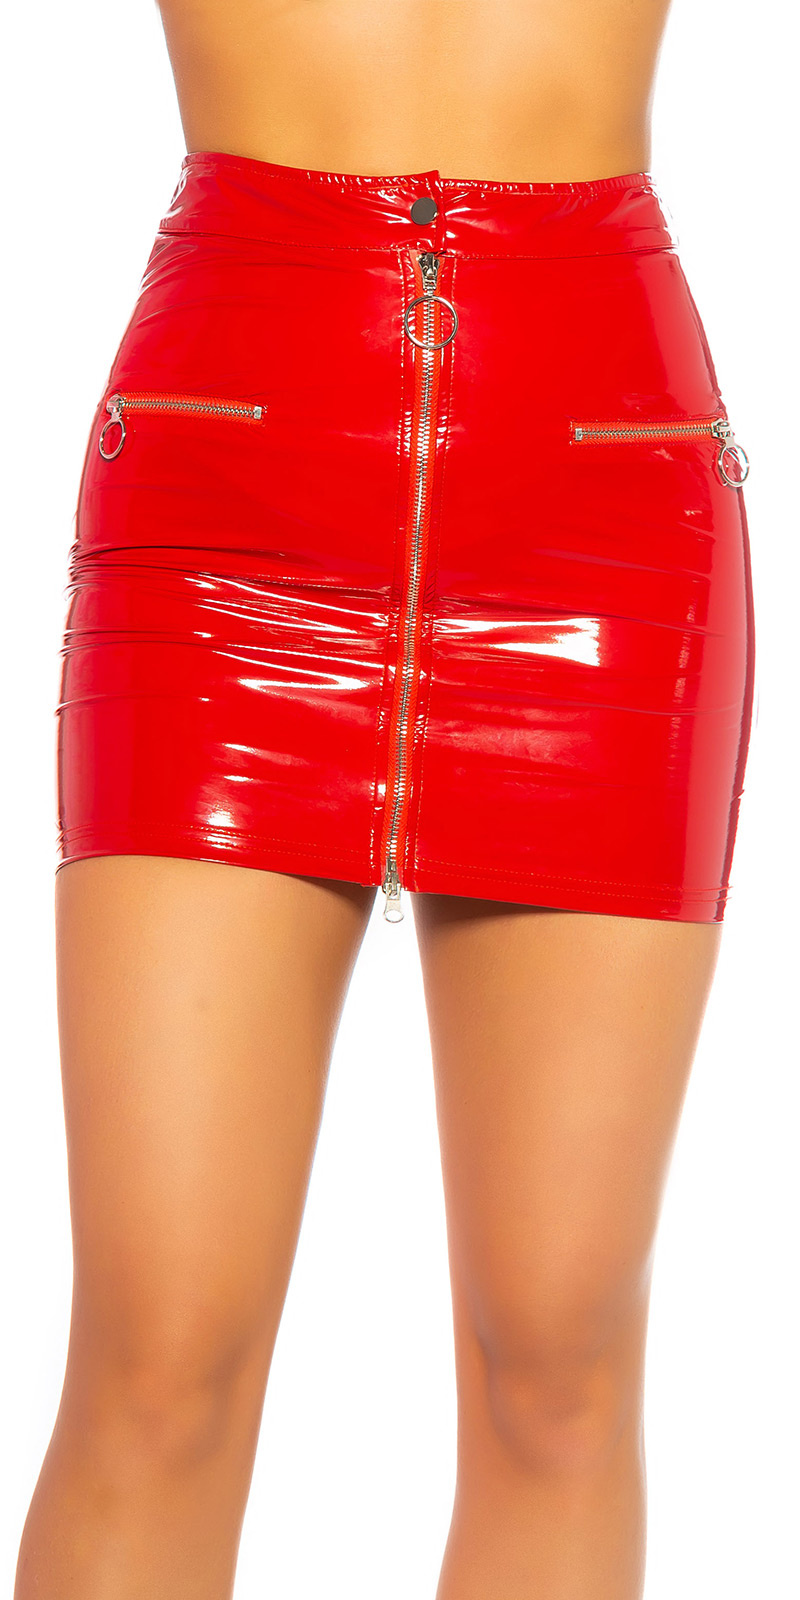 Sexy lederlook mini rokje met ritssluiting rood